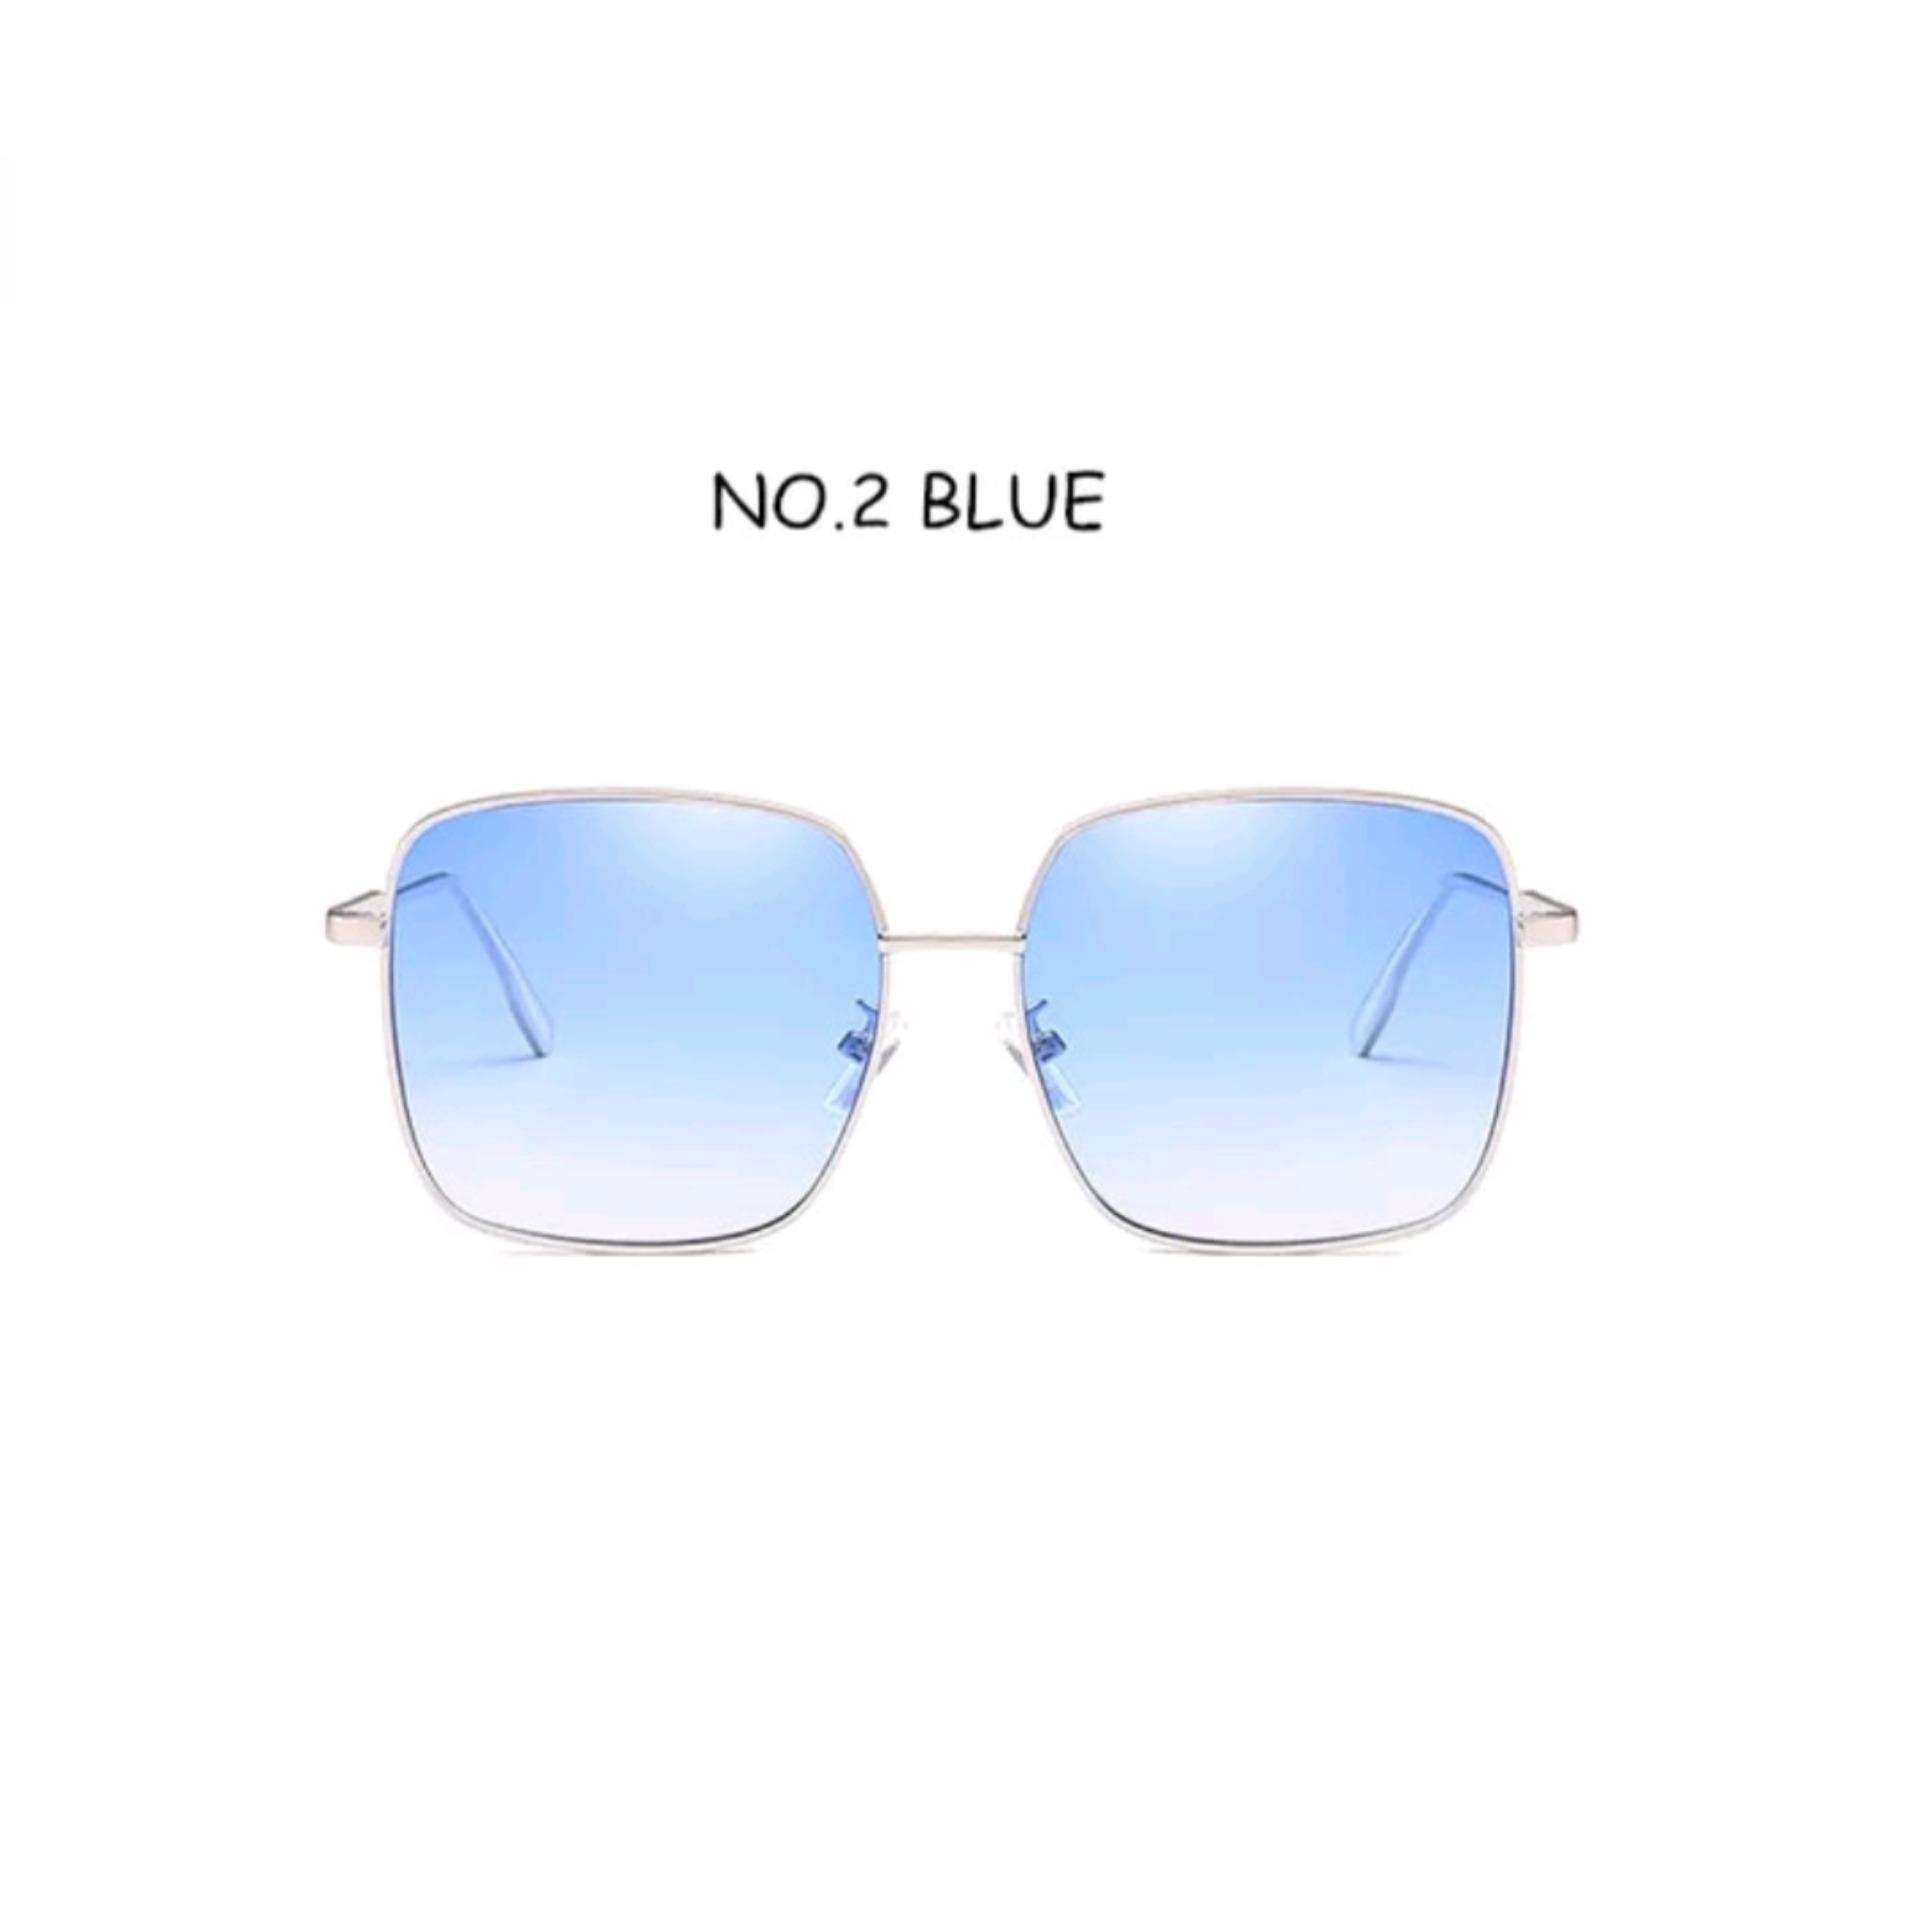 Fashionity Square Sunglasses - Kacamata Wanita - Fashion Nagita - Kacamata Selebritis - Mn5016sqs By Timely Indonesia.